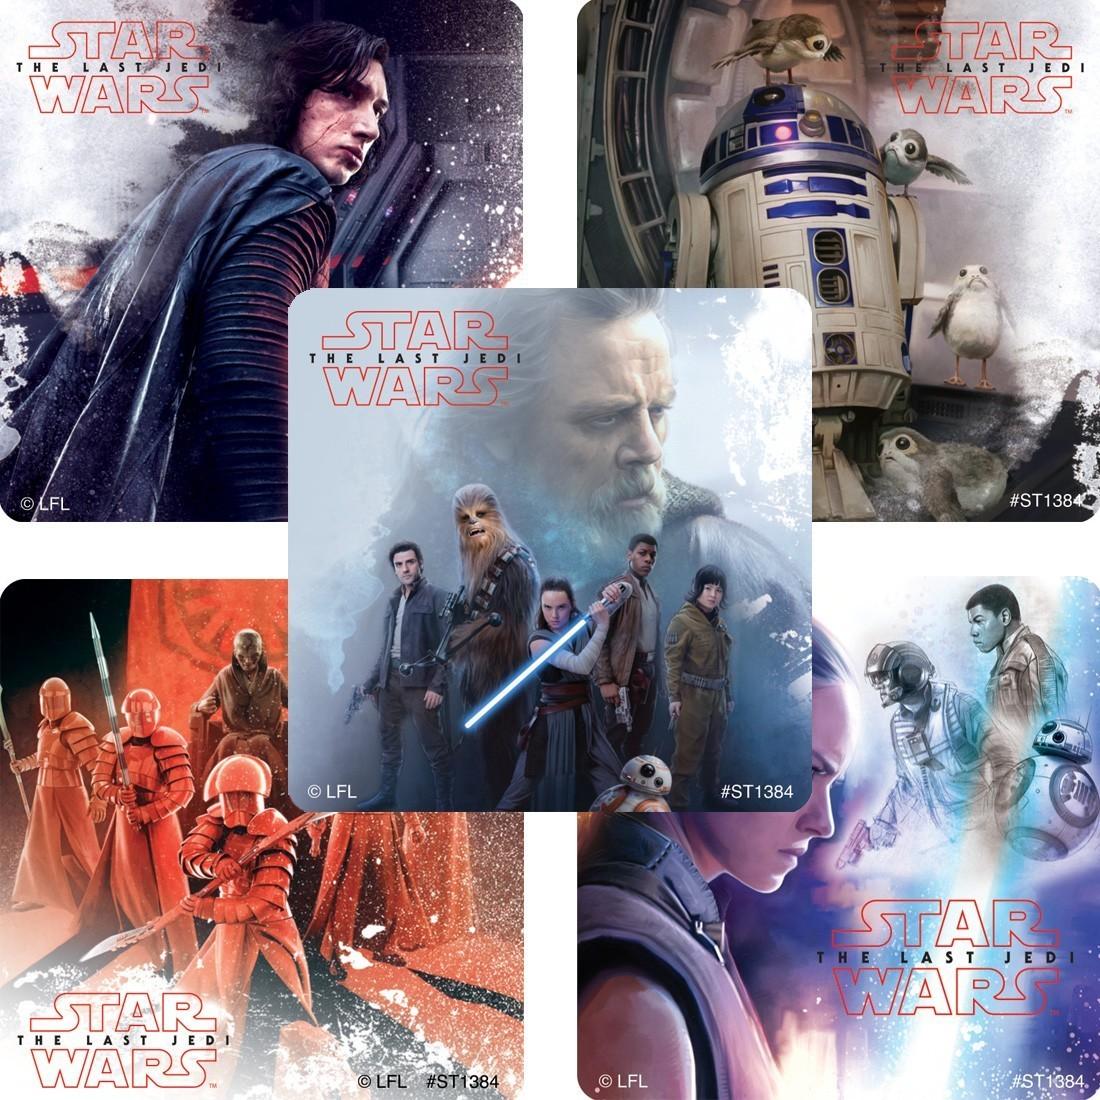 Star Wars: The Last Jedi Stickers [image]